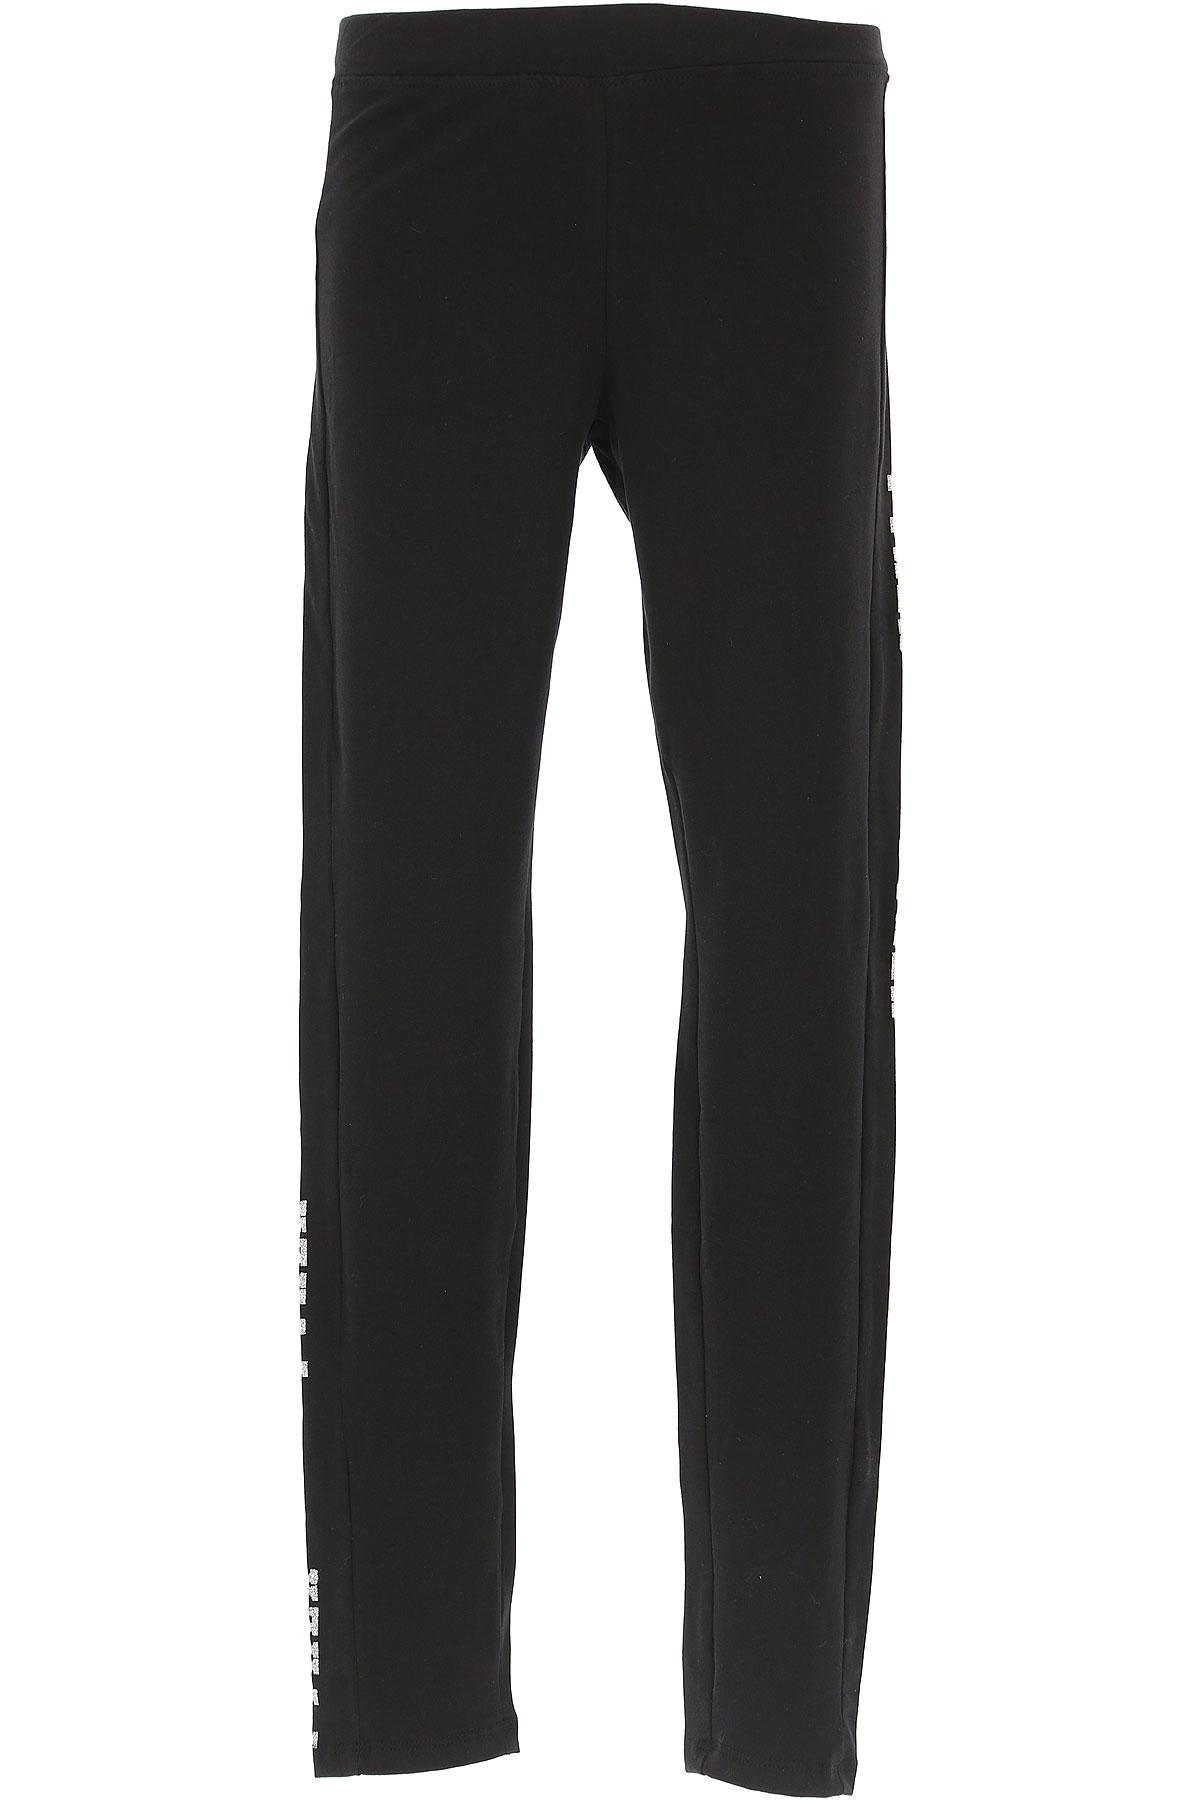 Image of Pyrex Kids Pants for Girls, Black, Cotton, 2017, S (8 Y) M (10 Y) L (12 Y) XL (14 Y) XXL (16 Y) XS